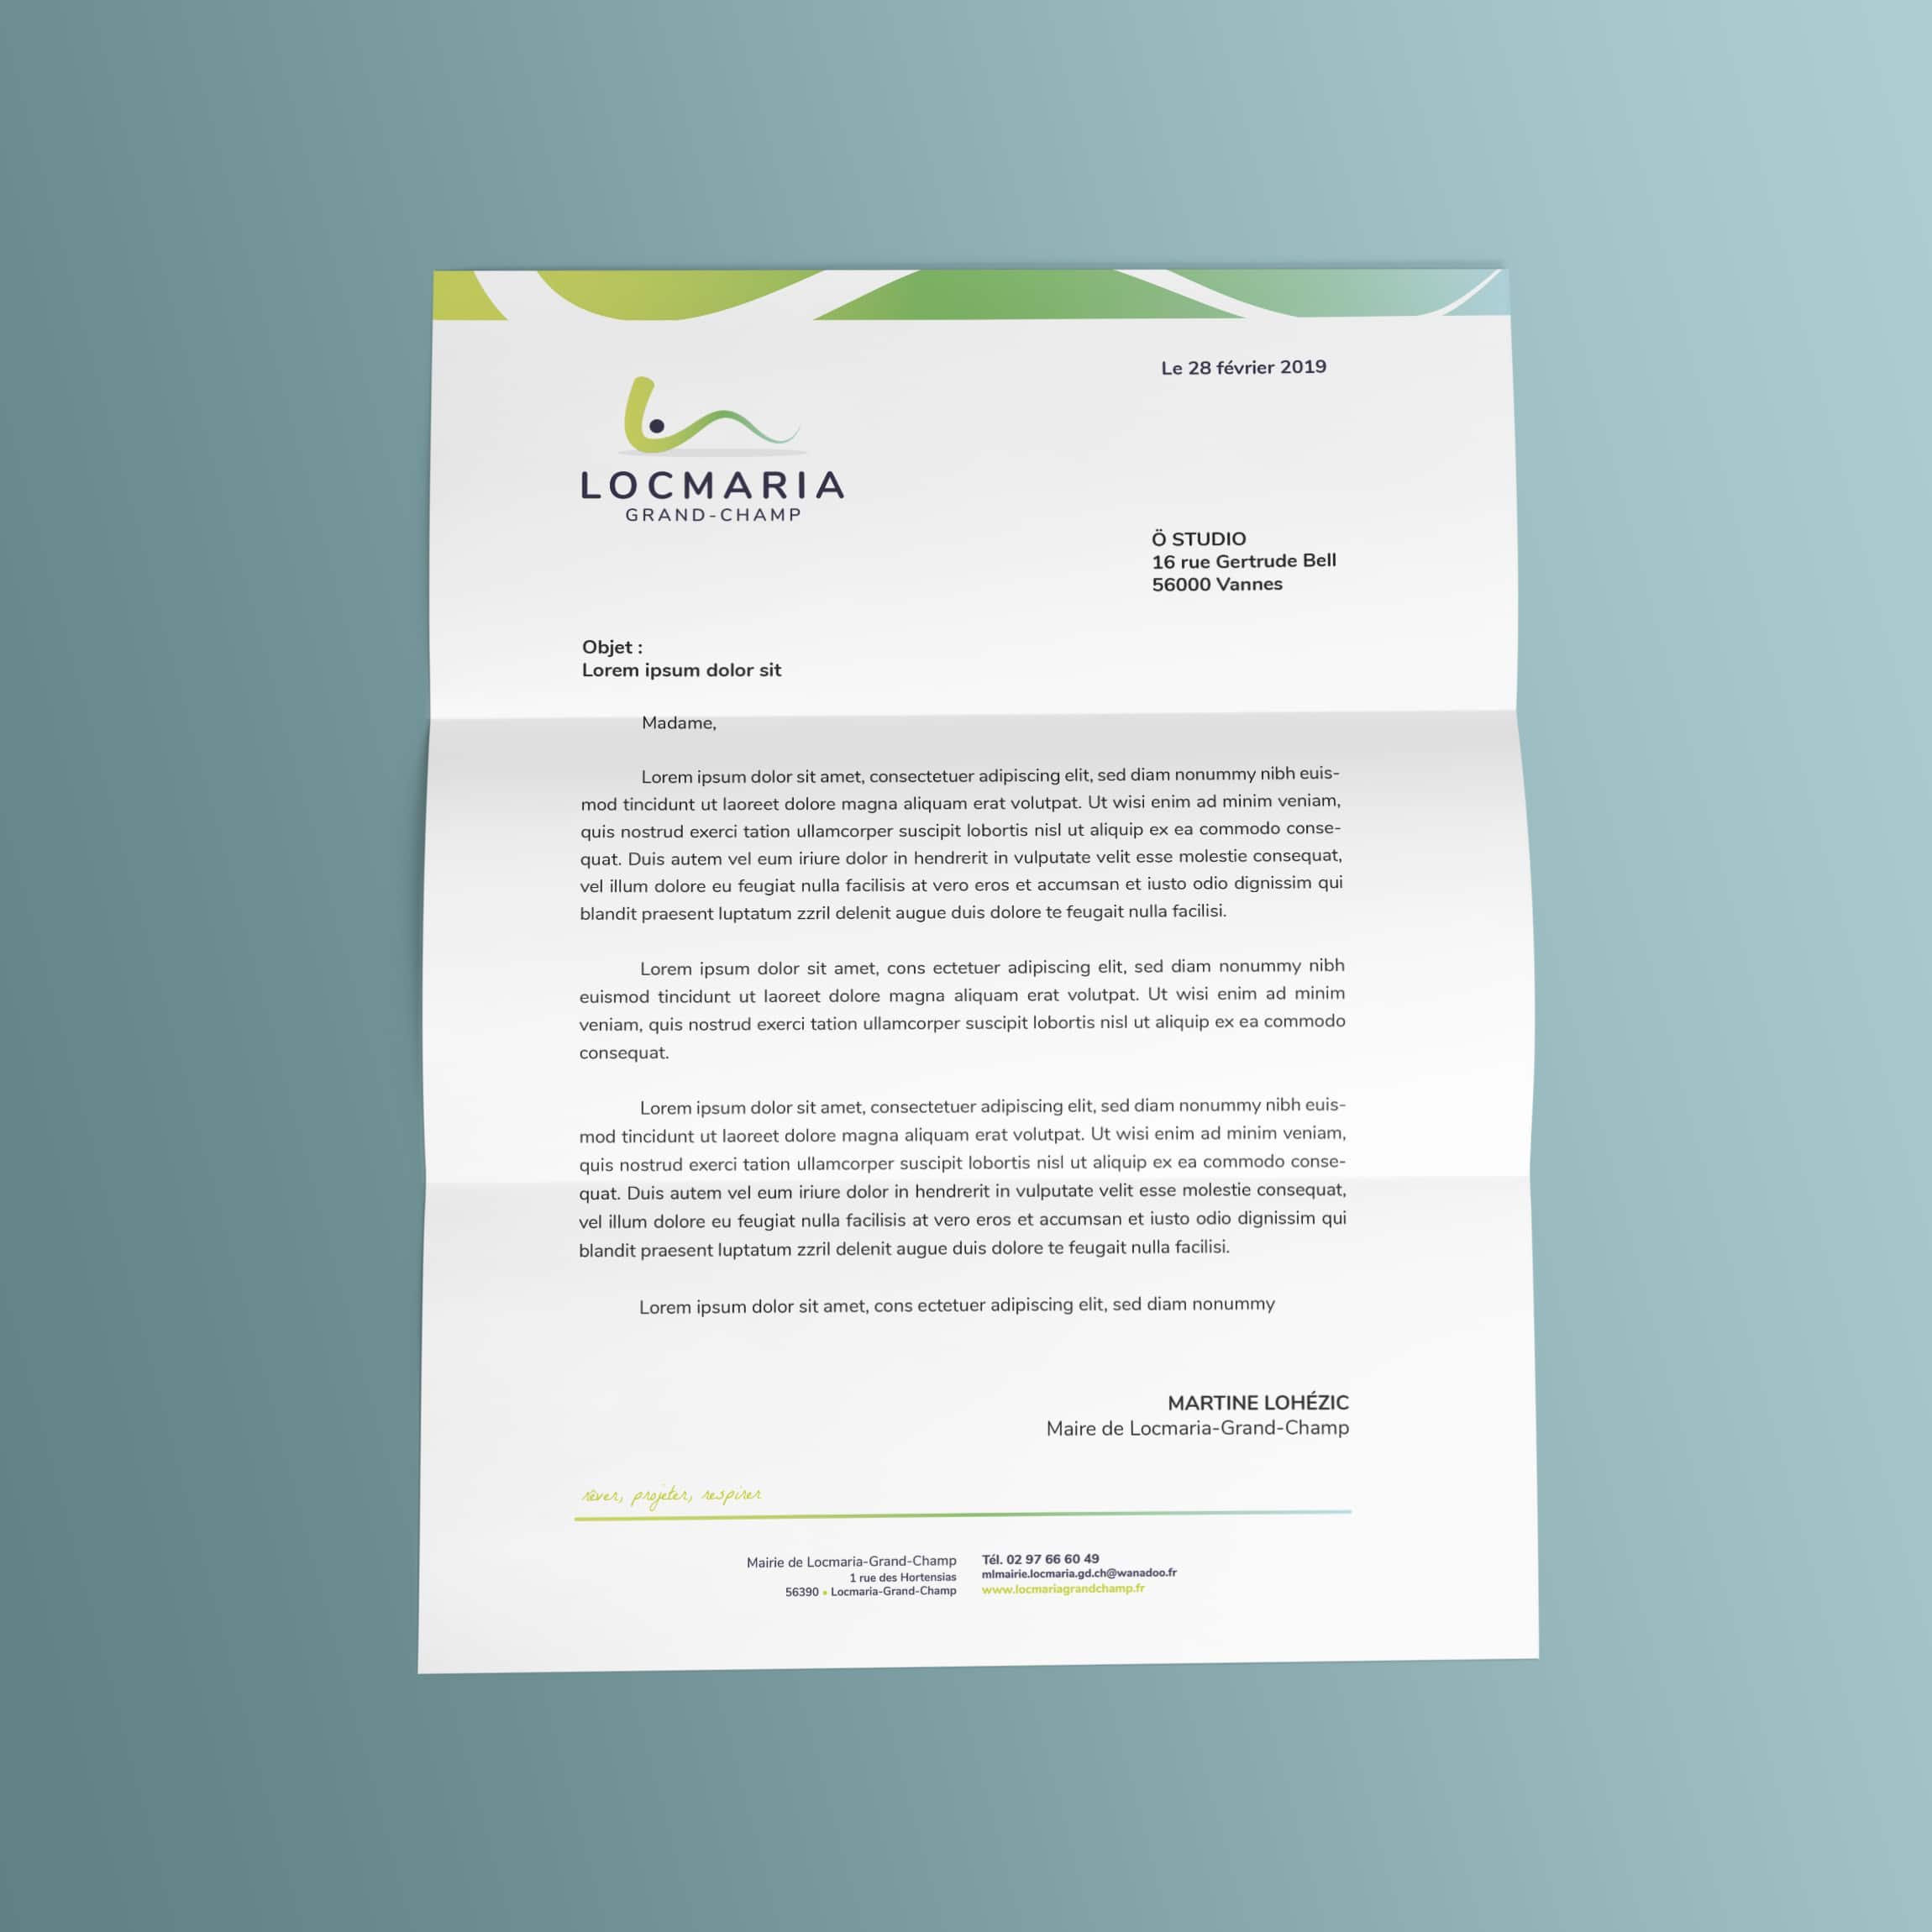 Locmaria-Grand-Champ lettre